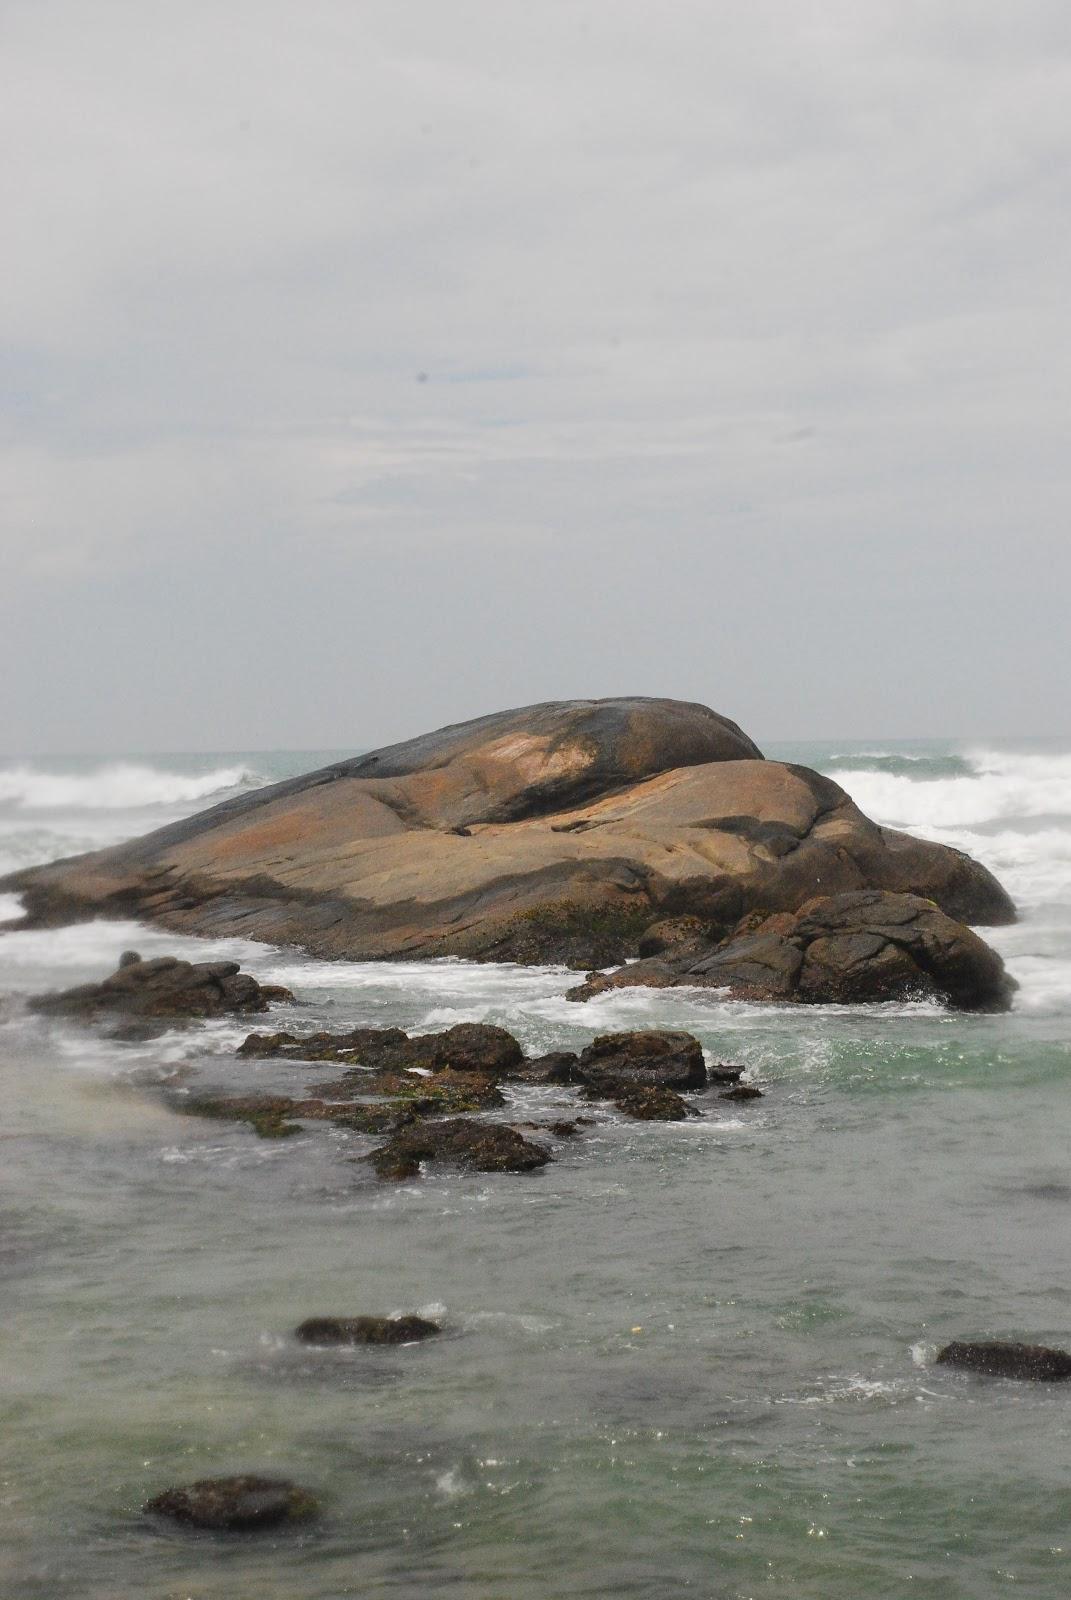 3 oceans meet in kanyakumari express